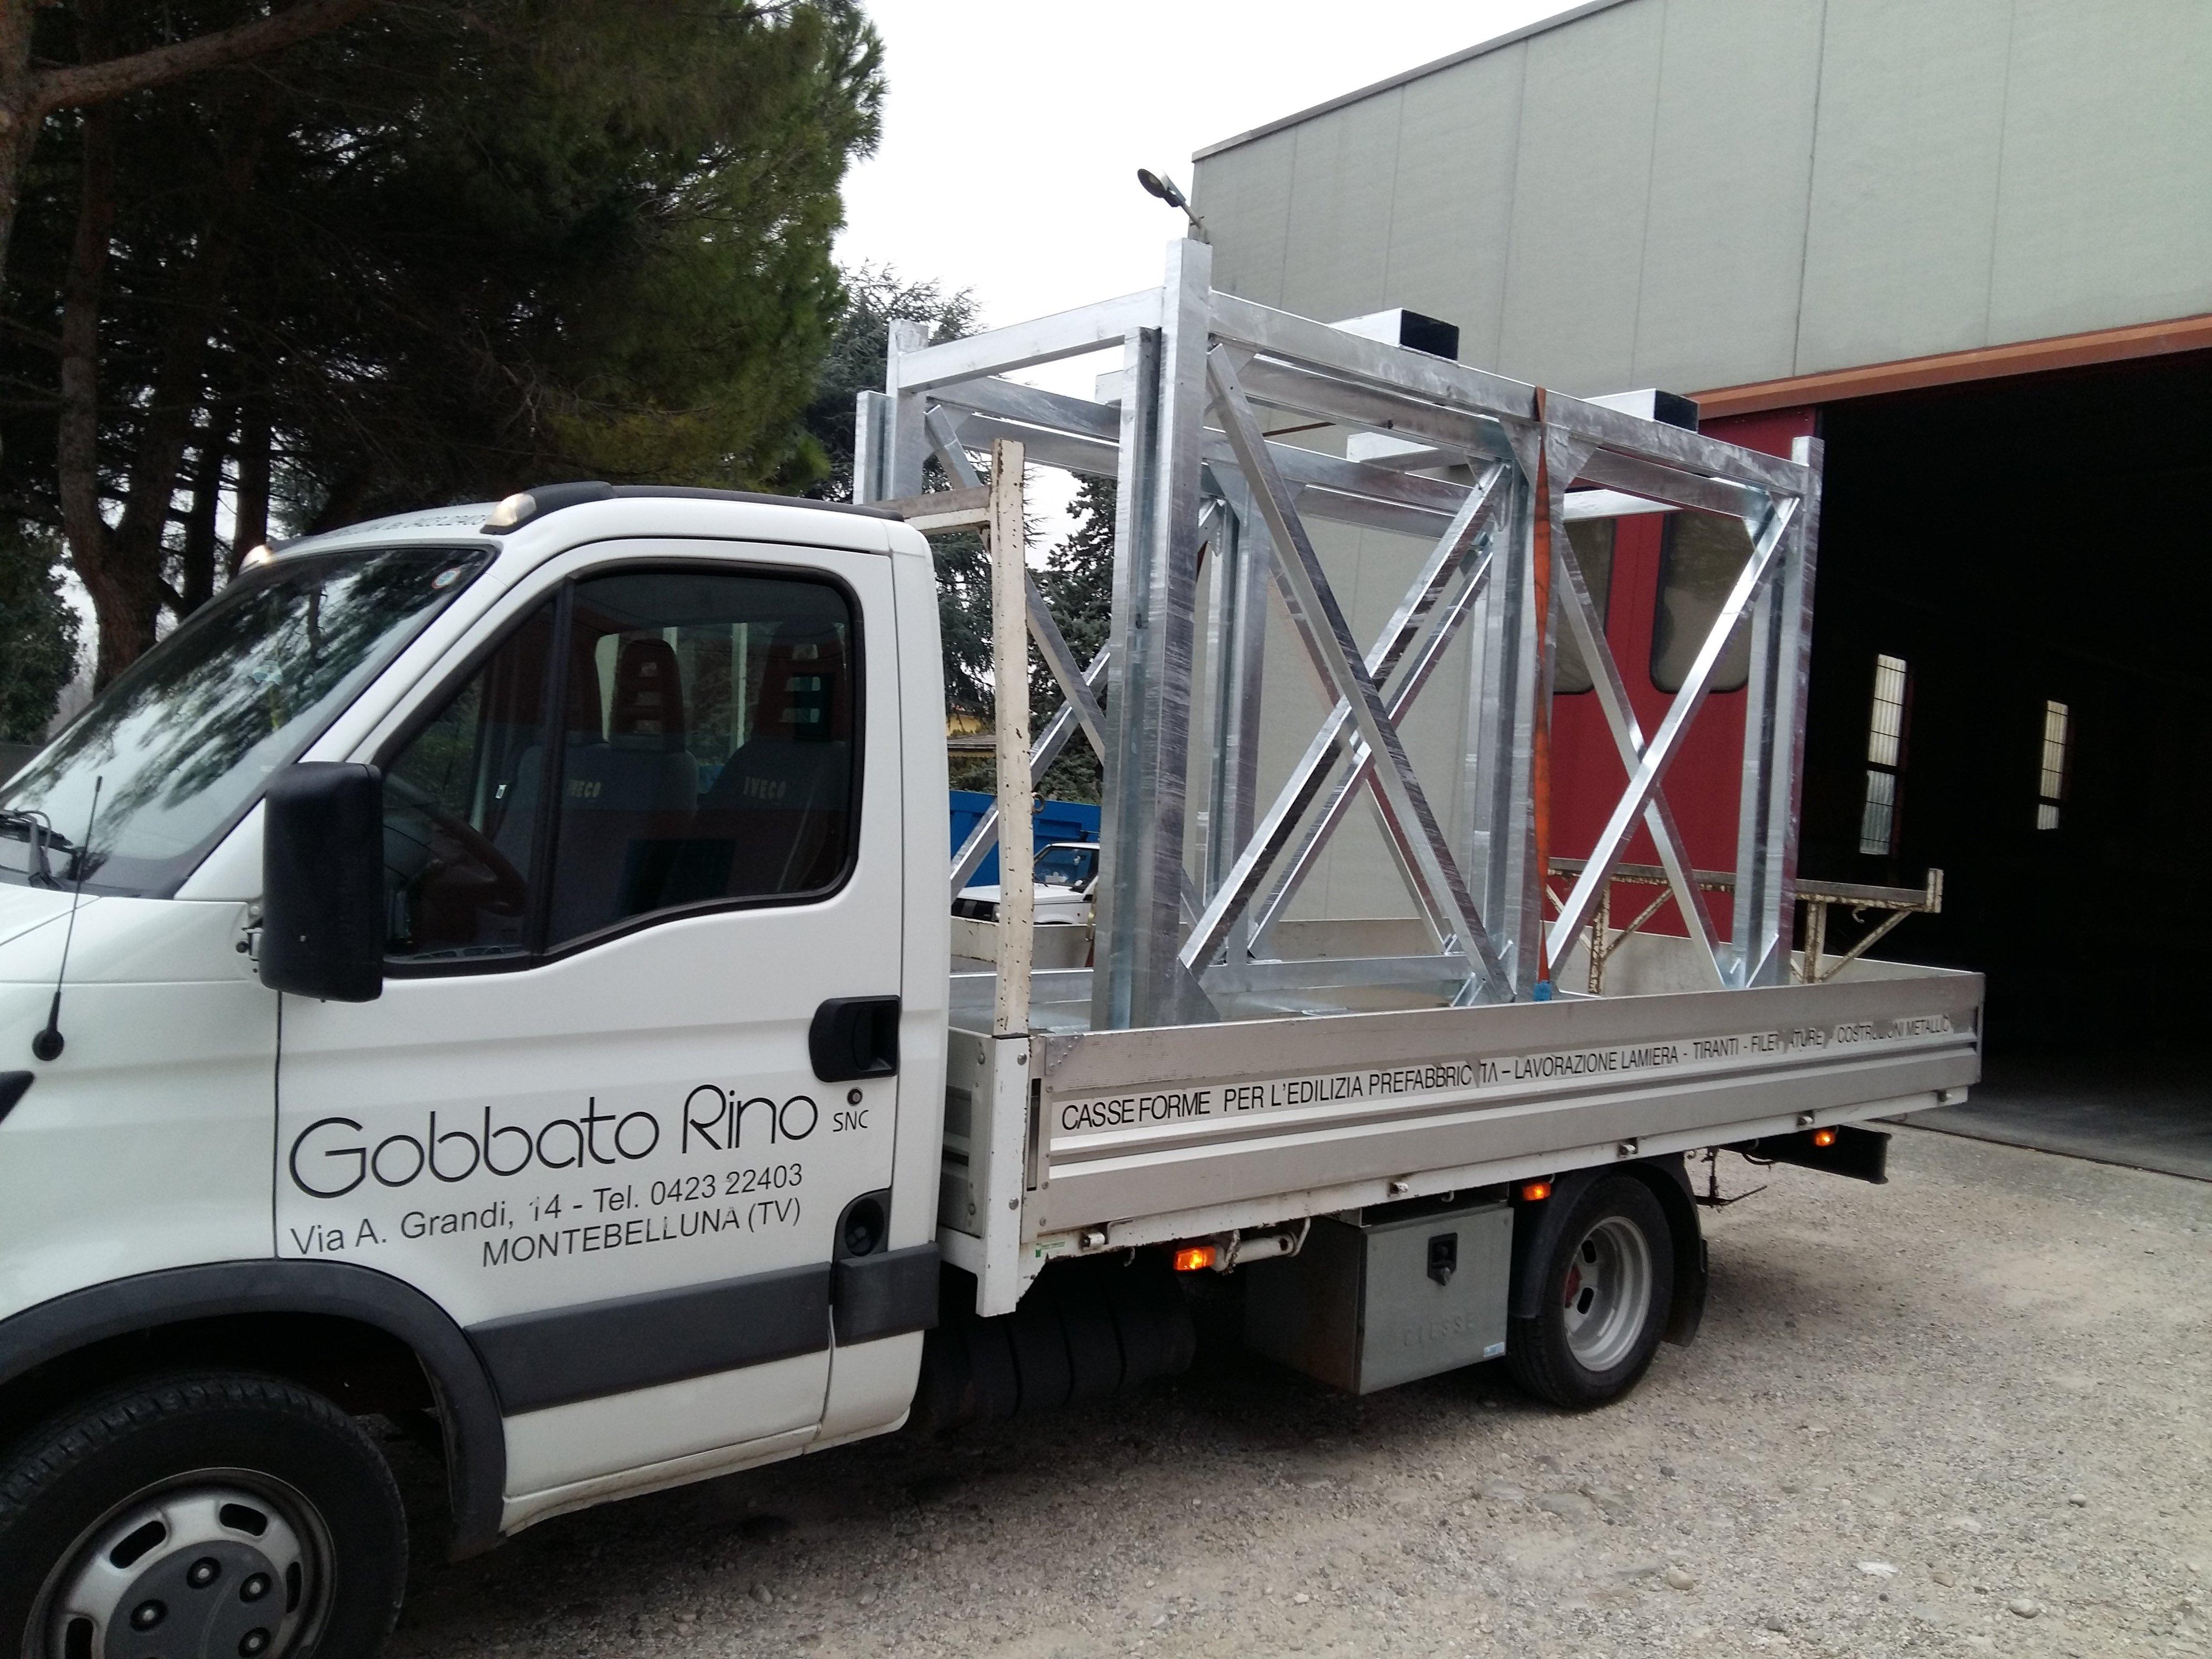 furgoncino bianco che trasporta una struttura metallica